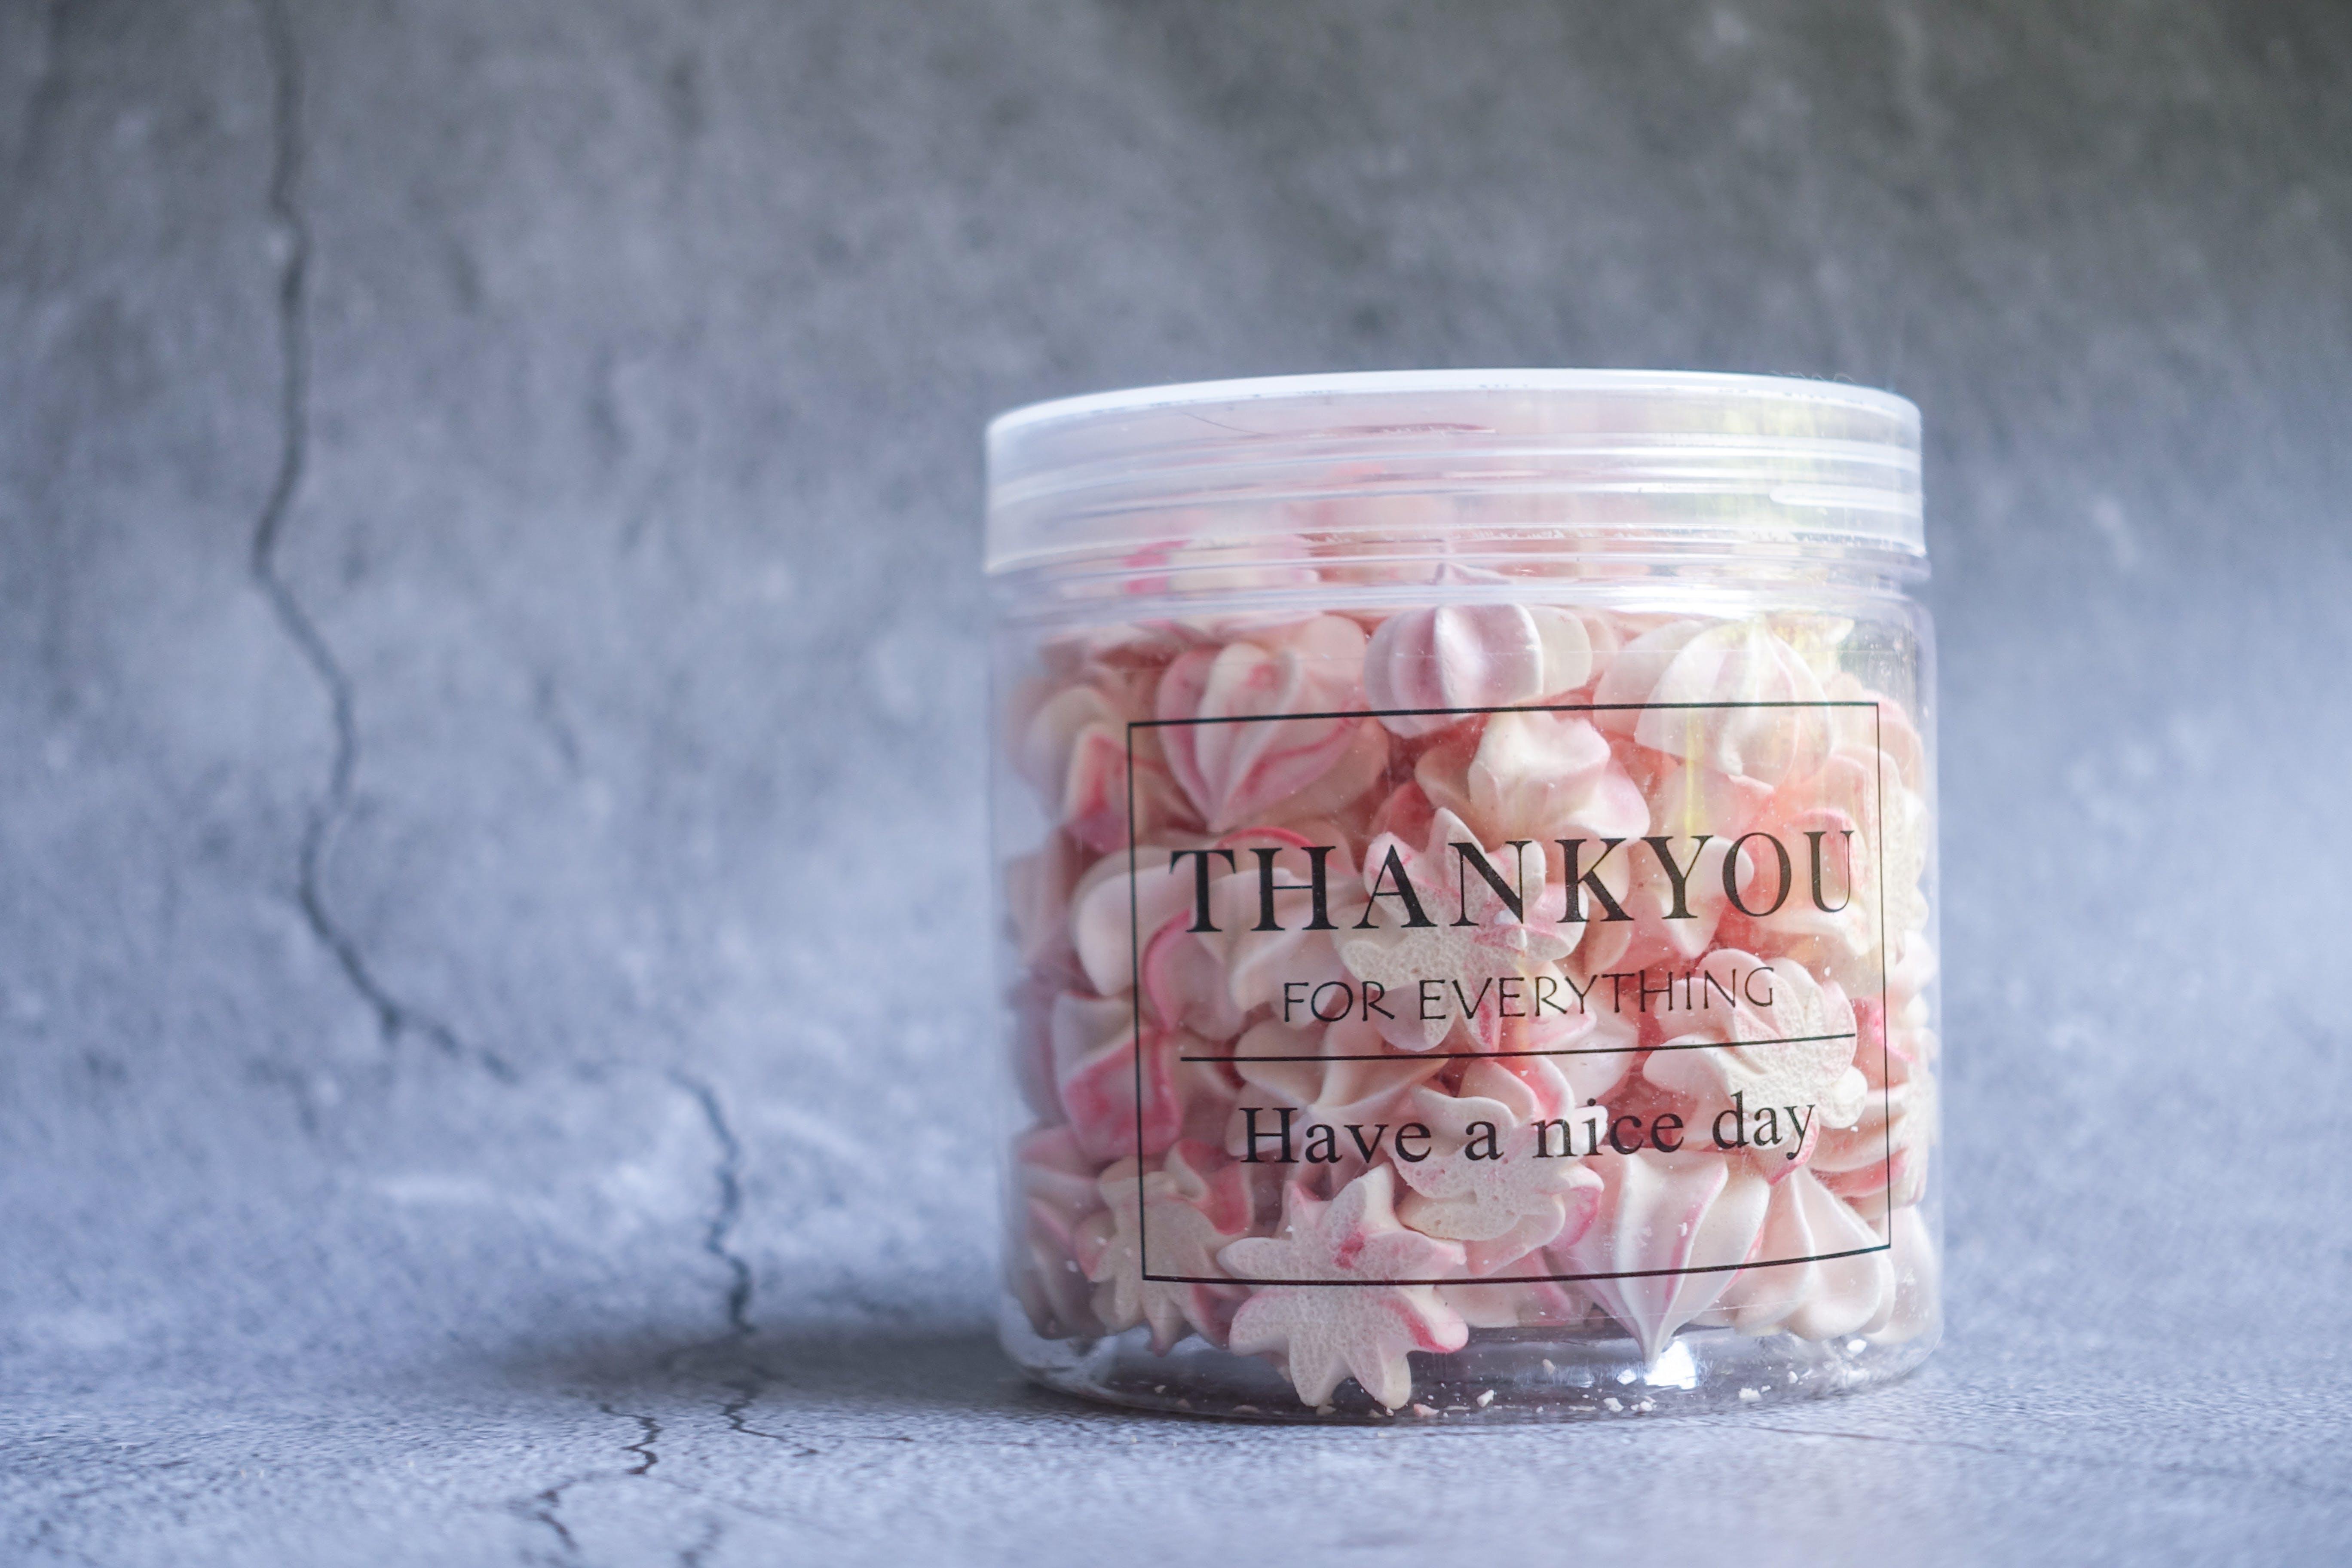 Sugar Treats Filled Plastic Jar With Thank You Print